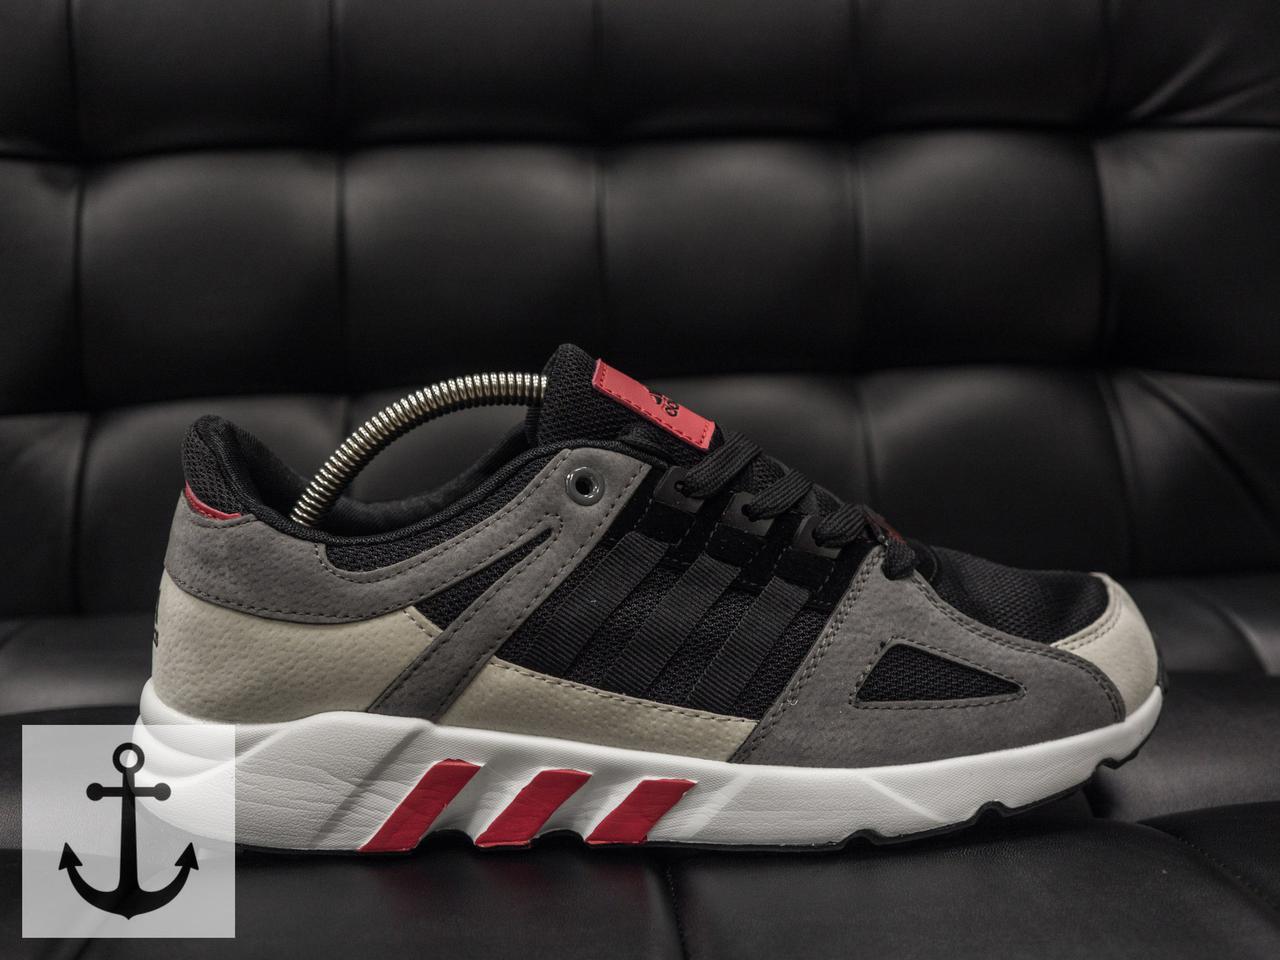 Adidas Sole Box   продажа, цена в Виннице. кроссовки, кеды ... 3b37da9951c